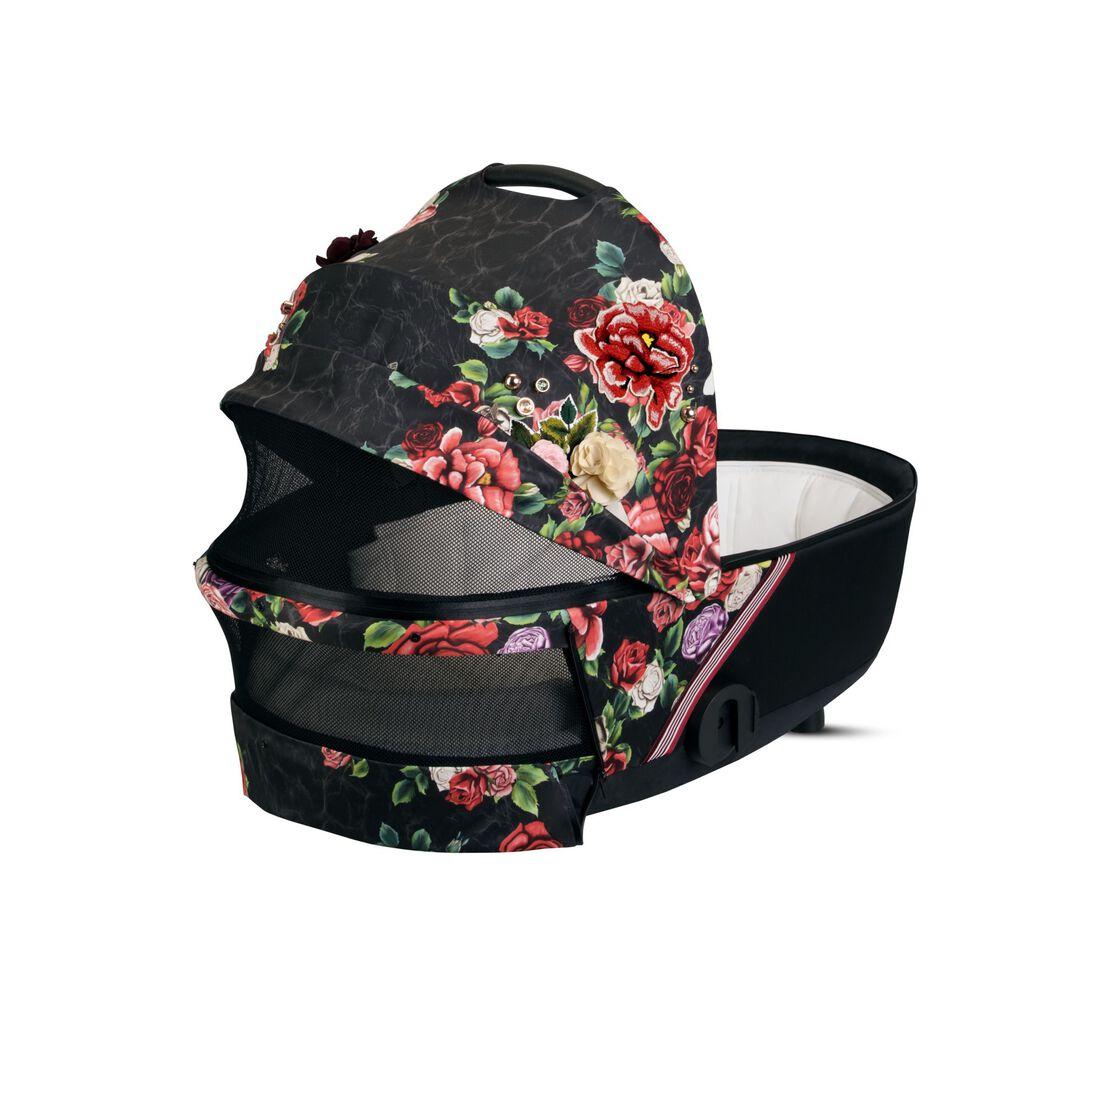 CYBEX Mios Lux Carry Cot - Spring Blossom Dark in Spring Blossom Dark large Bild 3